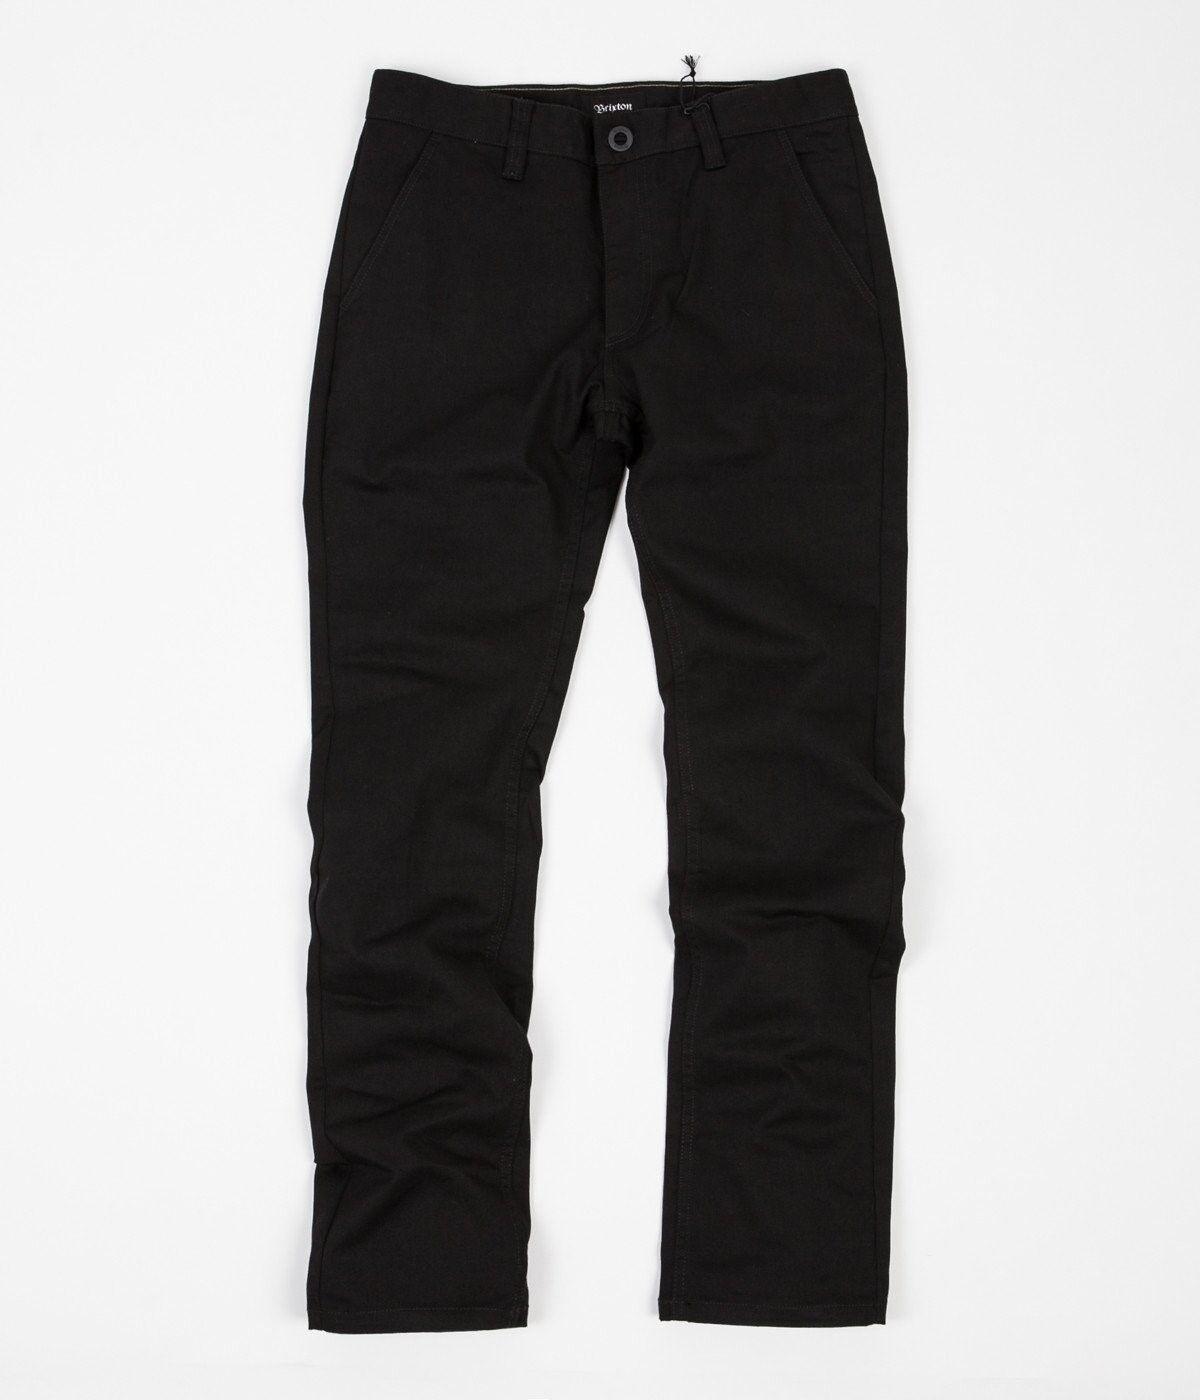 Brixton Reserve Chino Pant Trousers Standard Fit schwarz Straight Leg 36W 33L BNWT